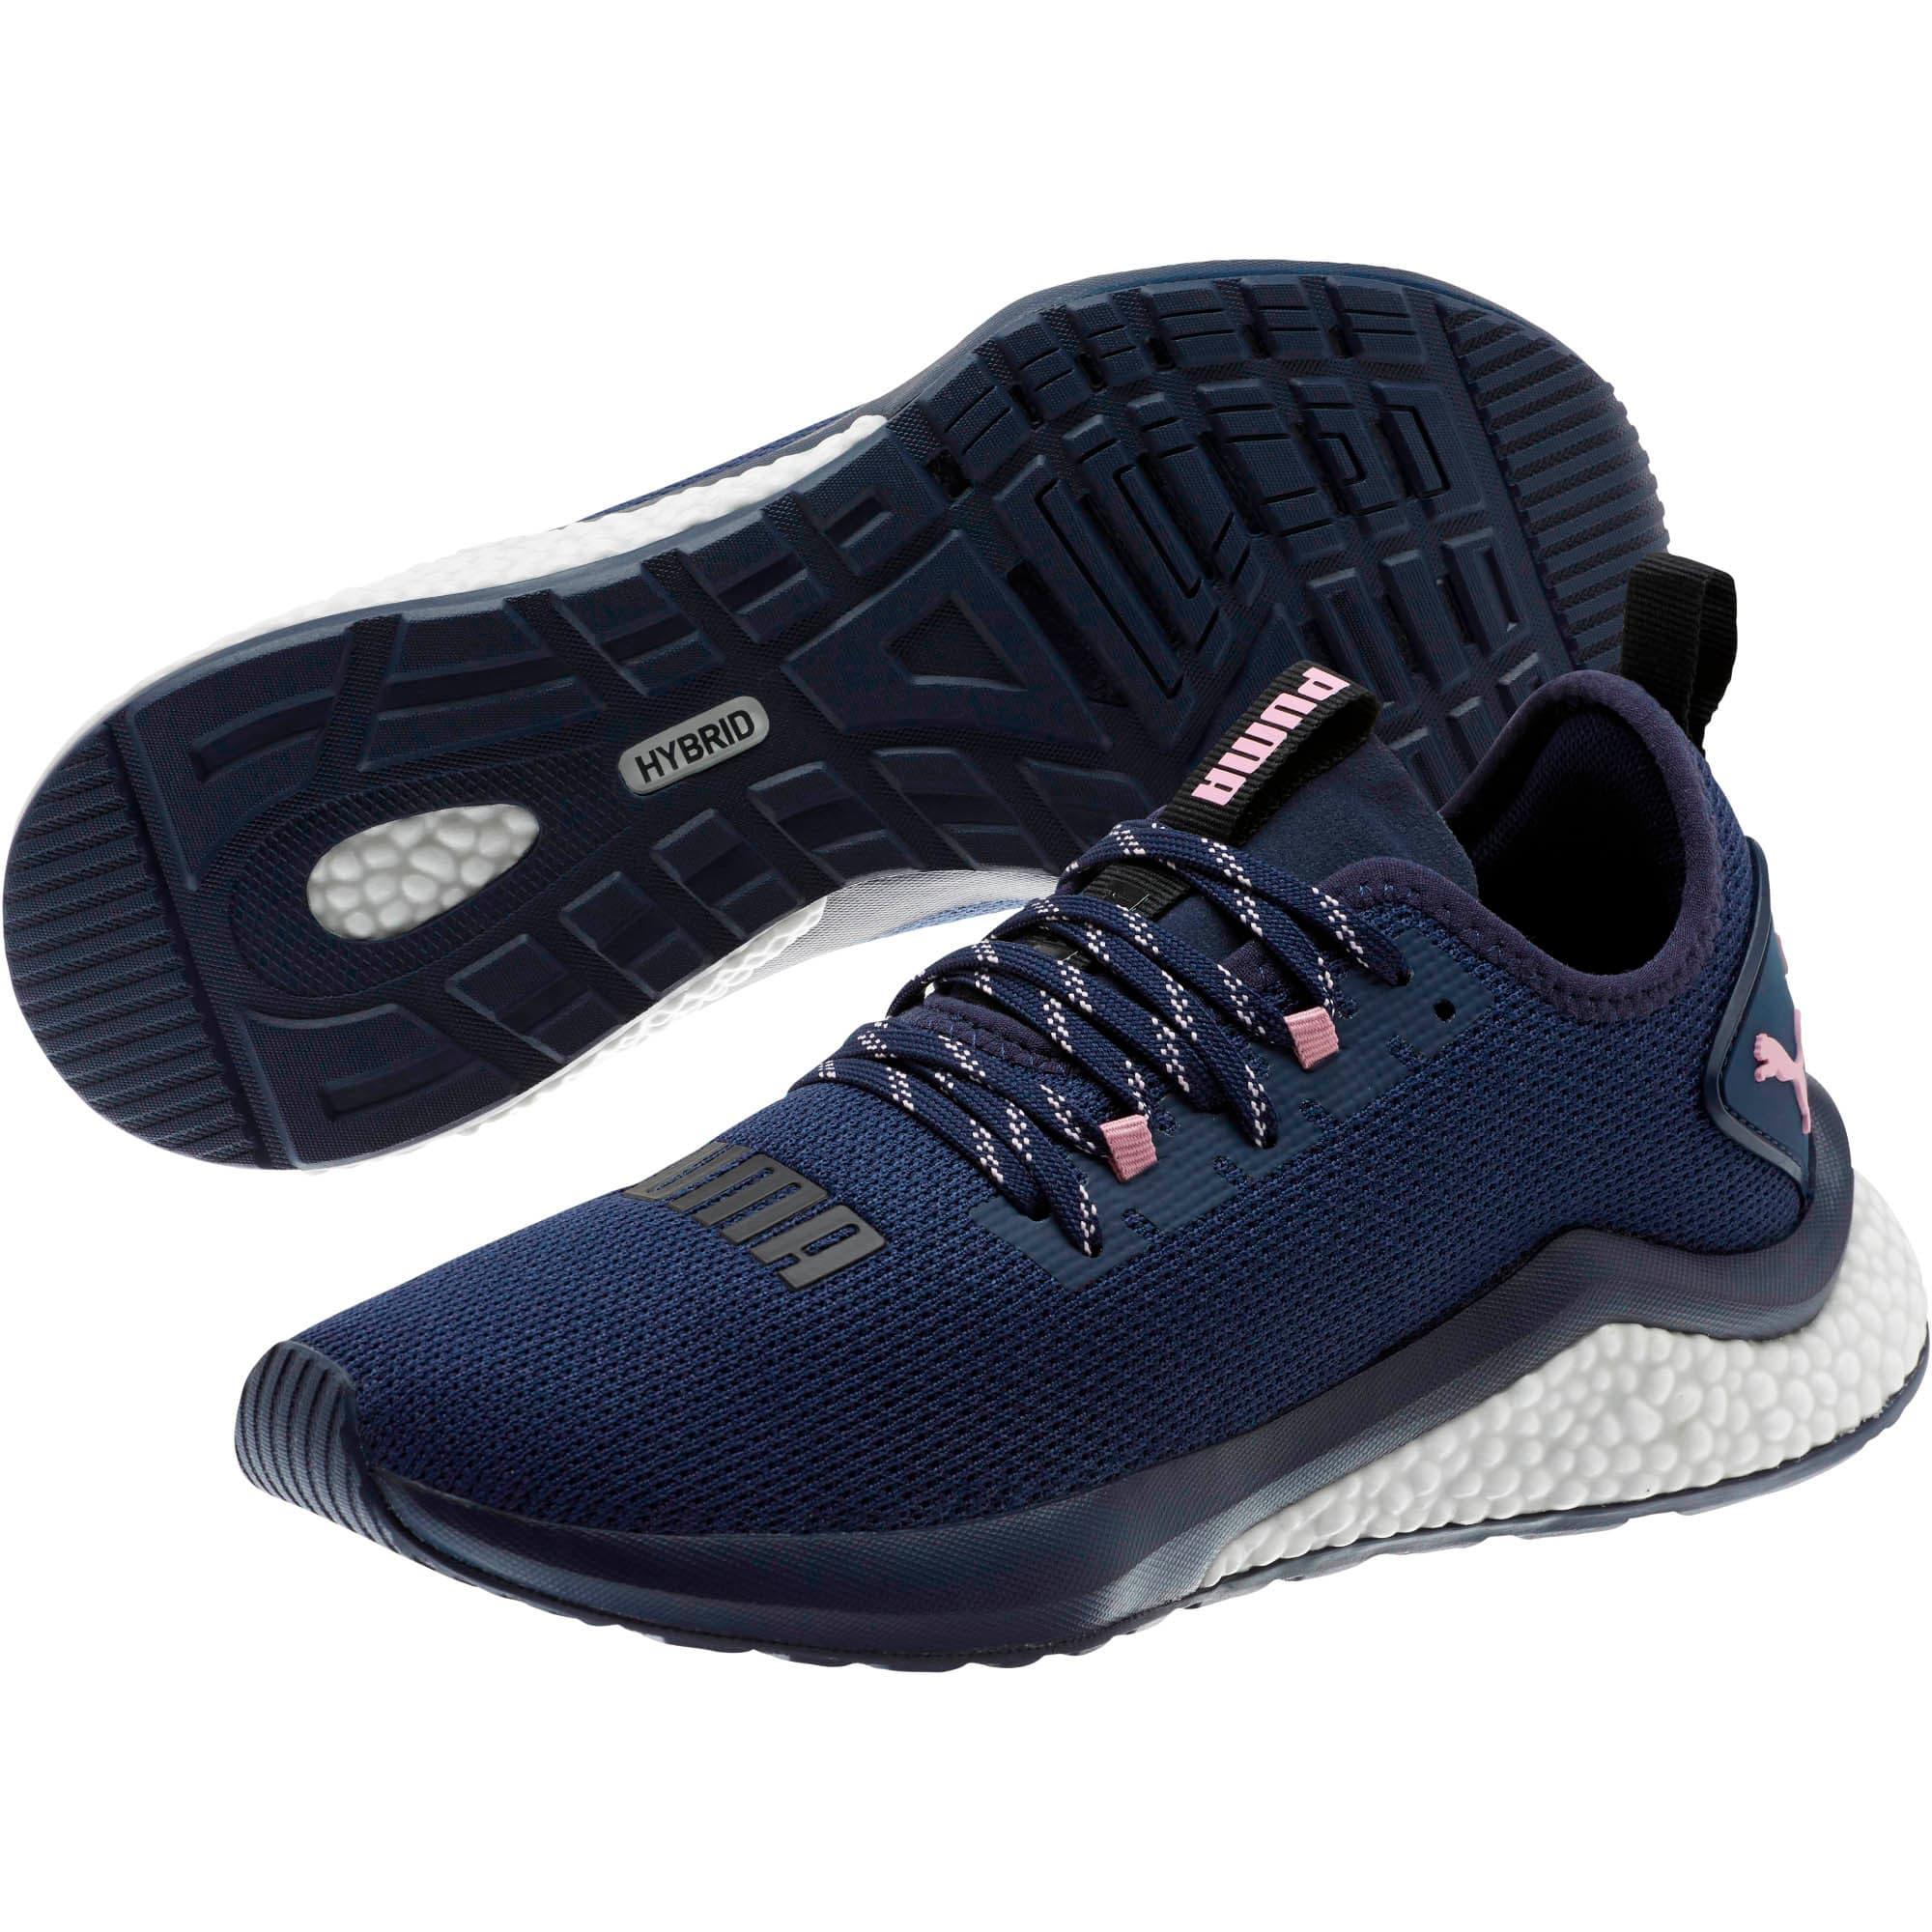 Thumbnail 2 of HYBRID NX Women's Running Shoes, Peacoat-Pale Pink, medium